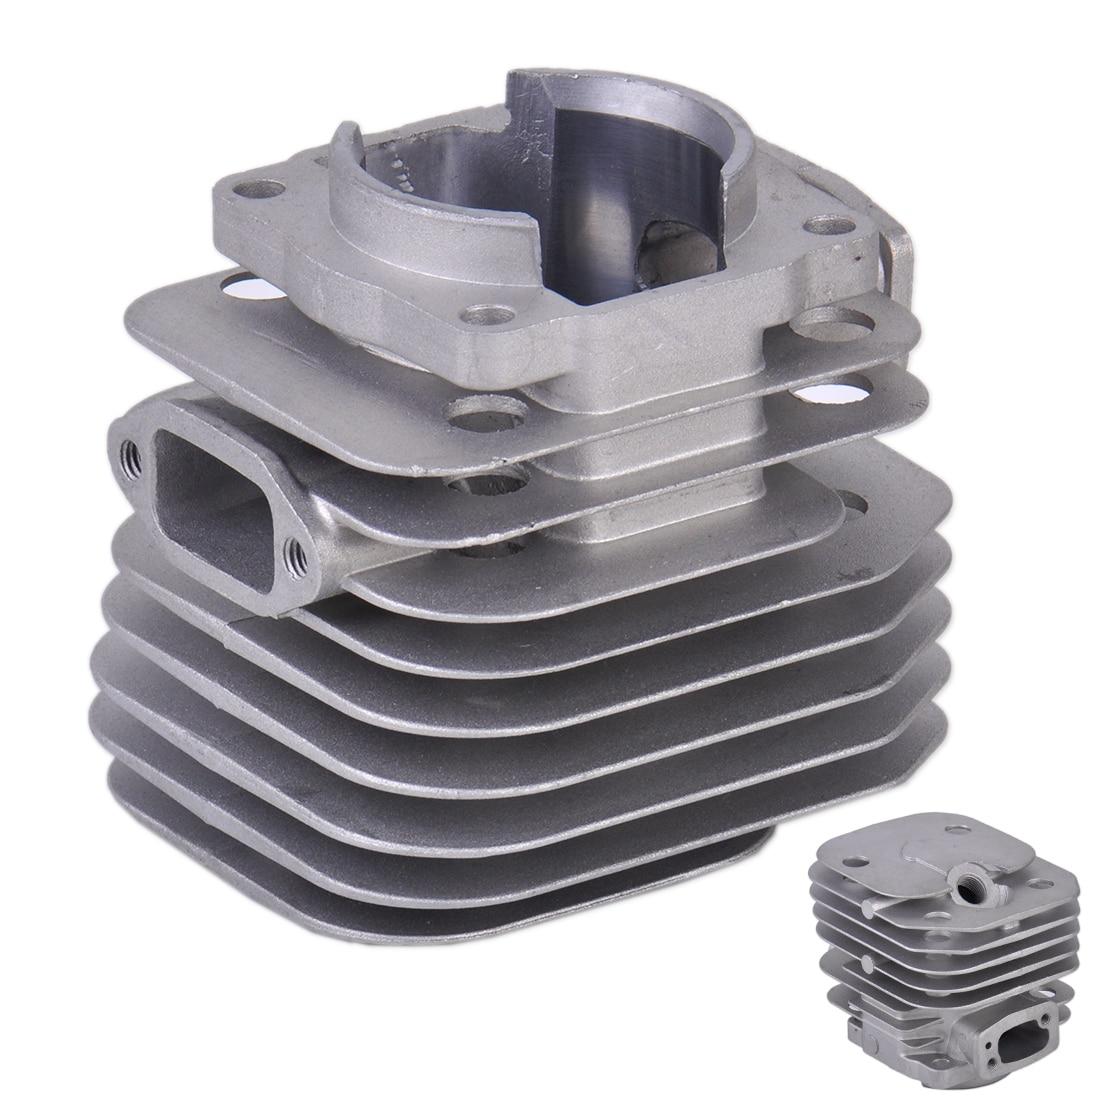 LETAOSK 50mm Piston Rings Assembly Kit fit for Husqvarna 371 372 371XP 372XP Chainsaw 503691271 все цены